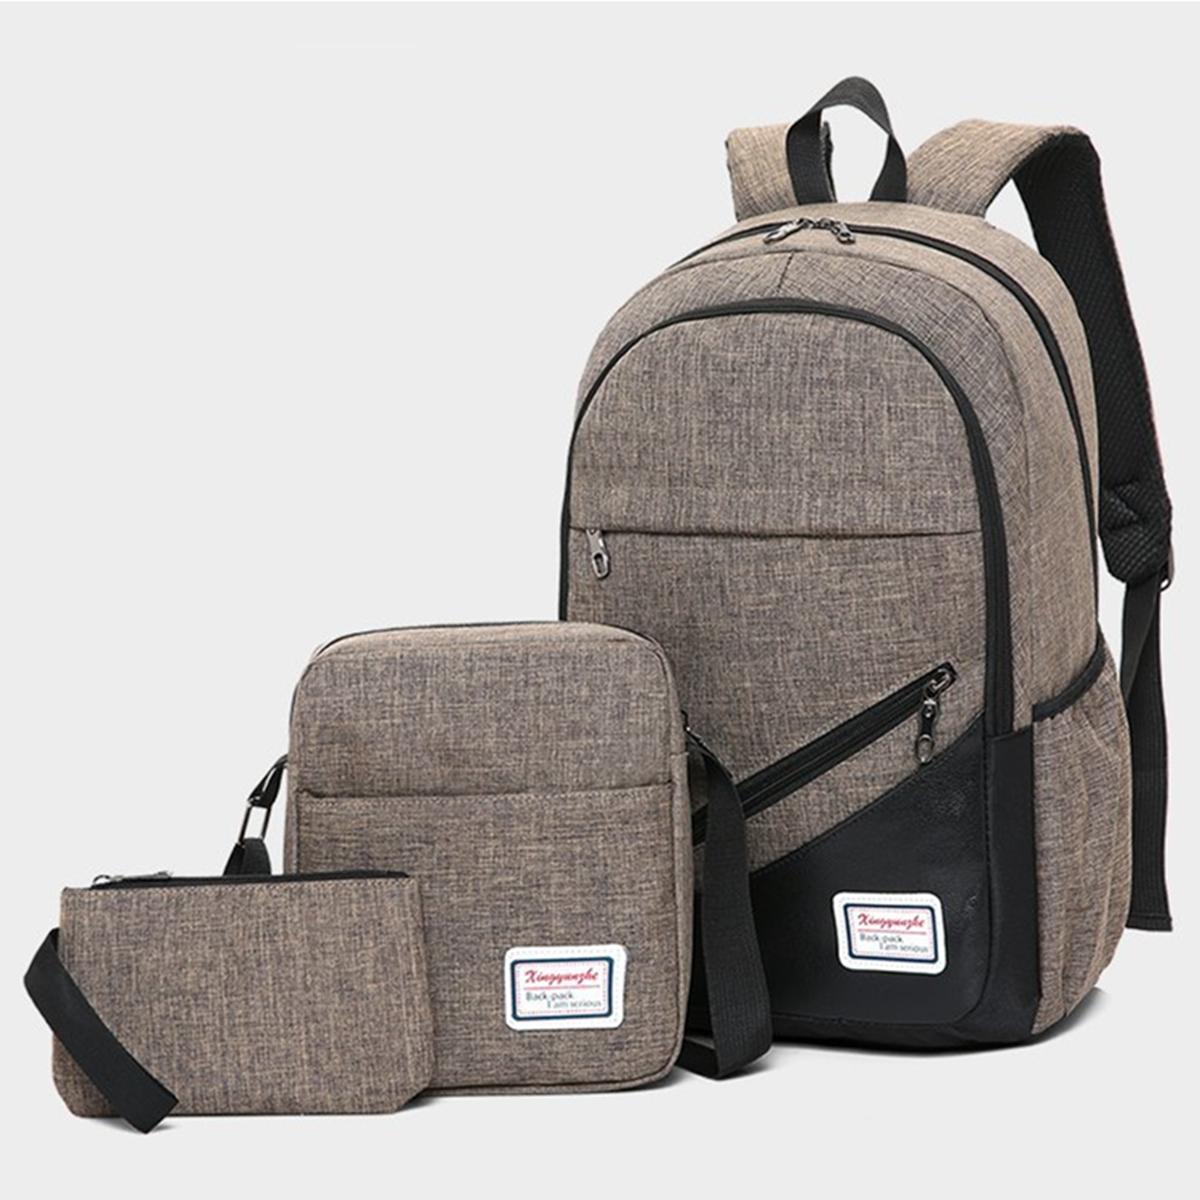 3pcs//set Boys School Bags Backpack for Teenagers Pencil Case Blue Book Bag Boy